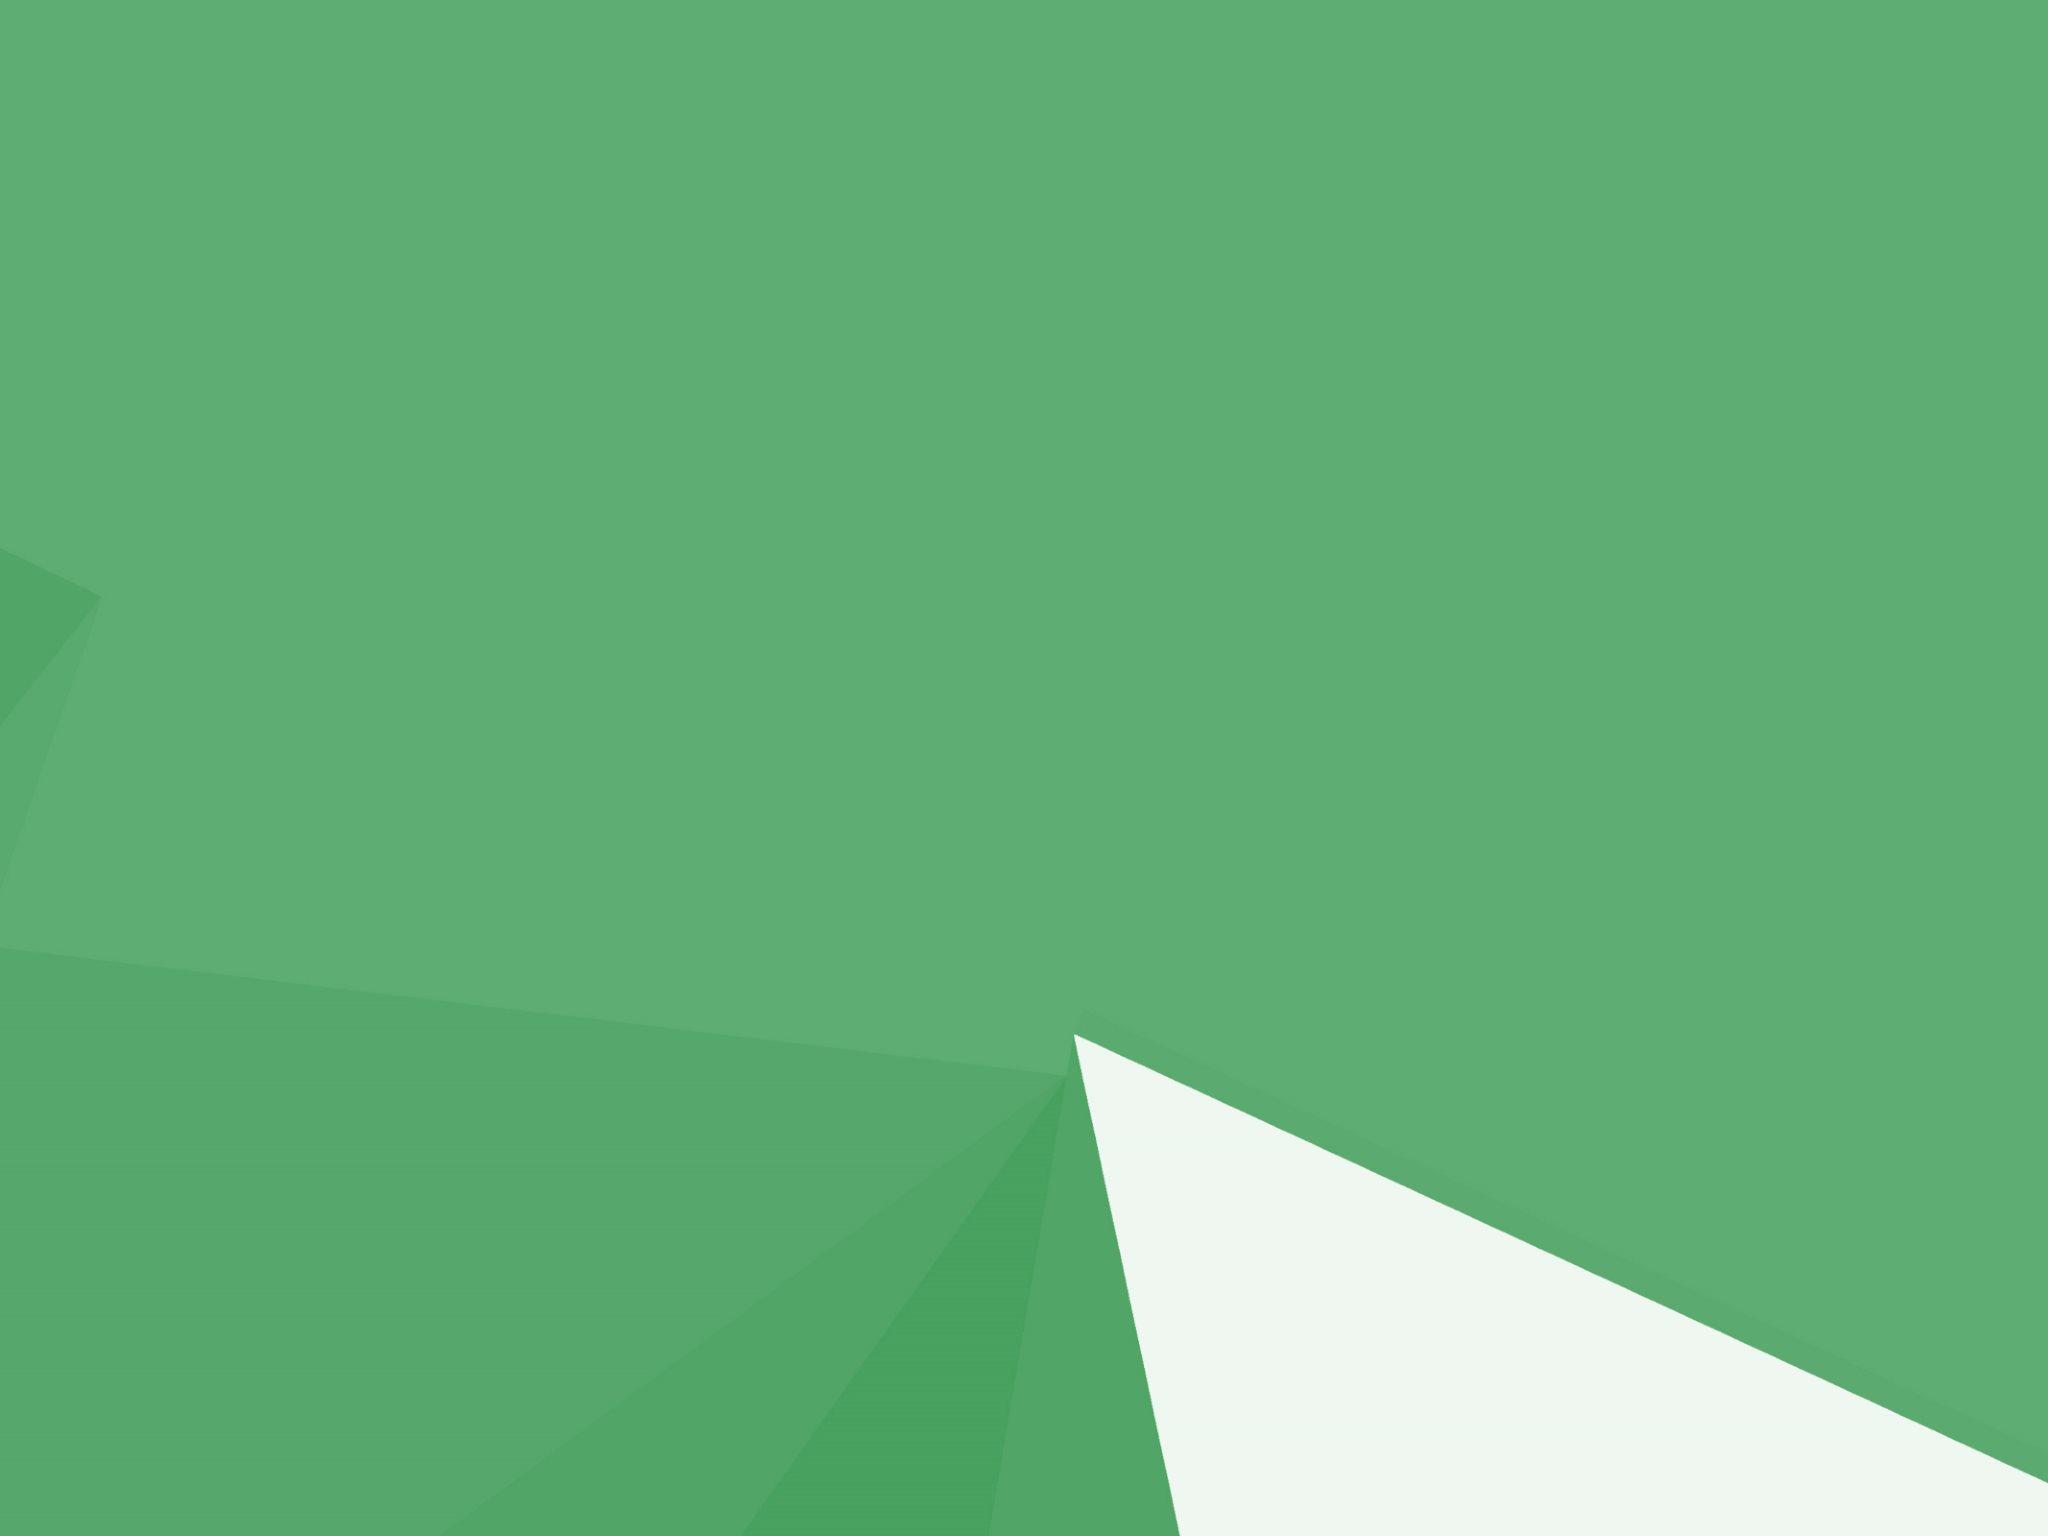 Windows 8.1 Green Wallpaper - WallpaperSafari